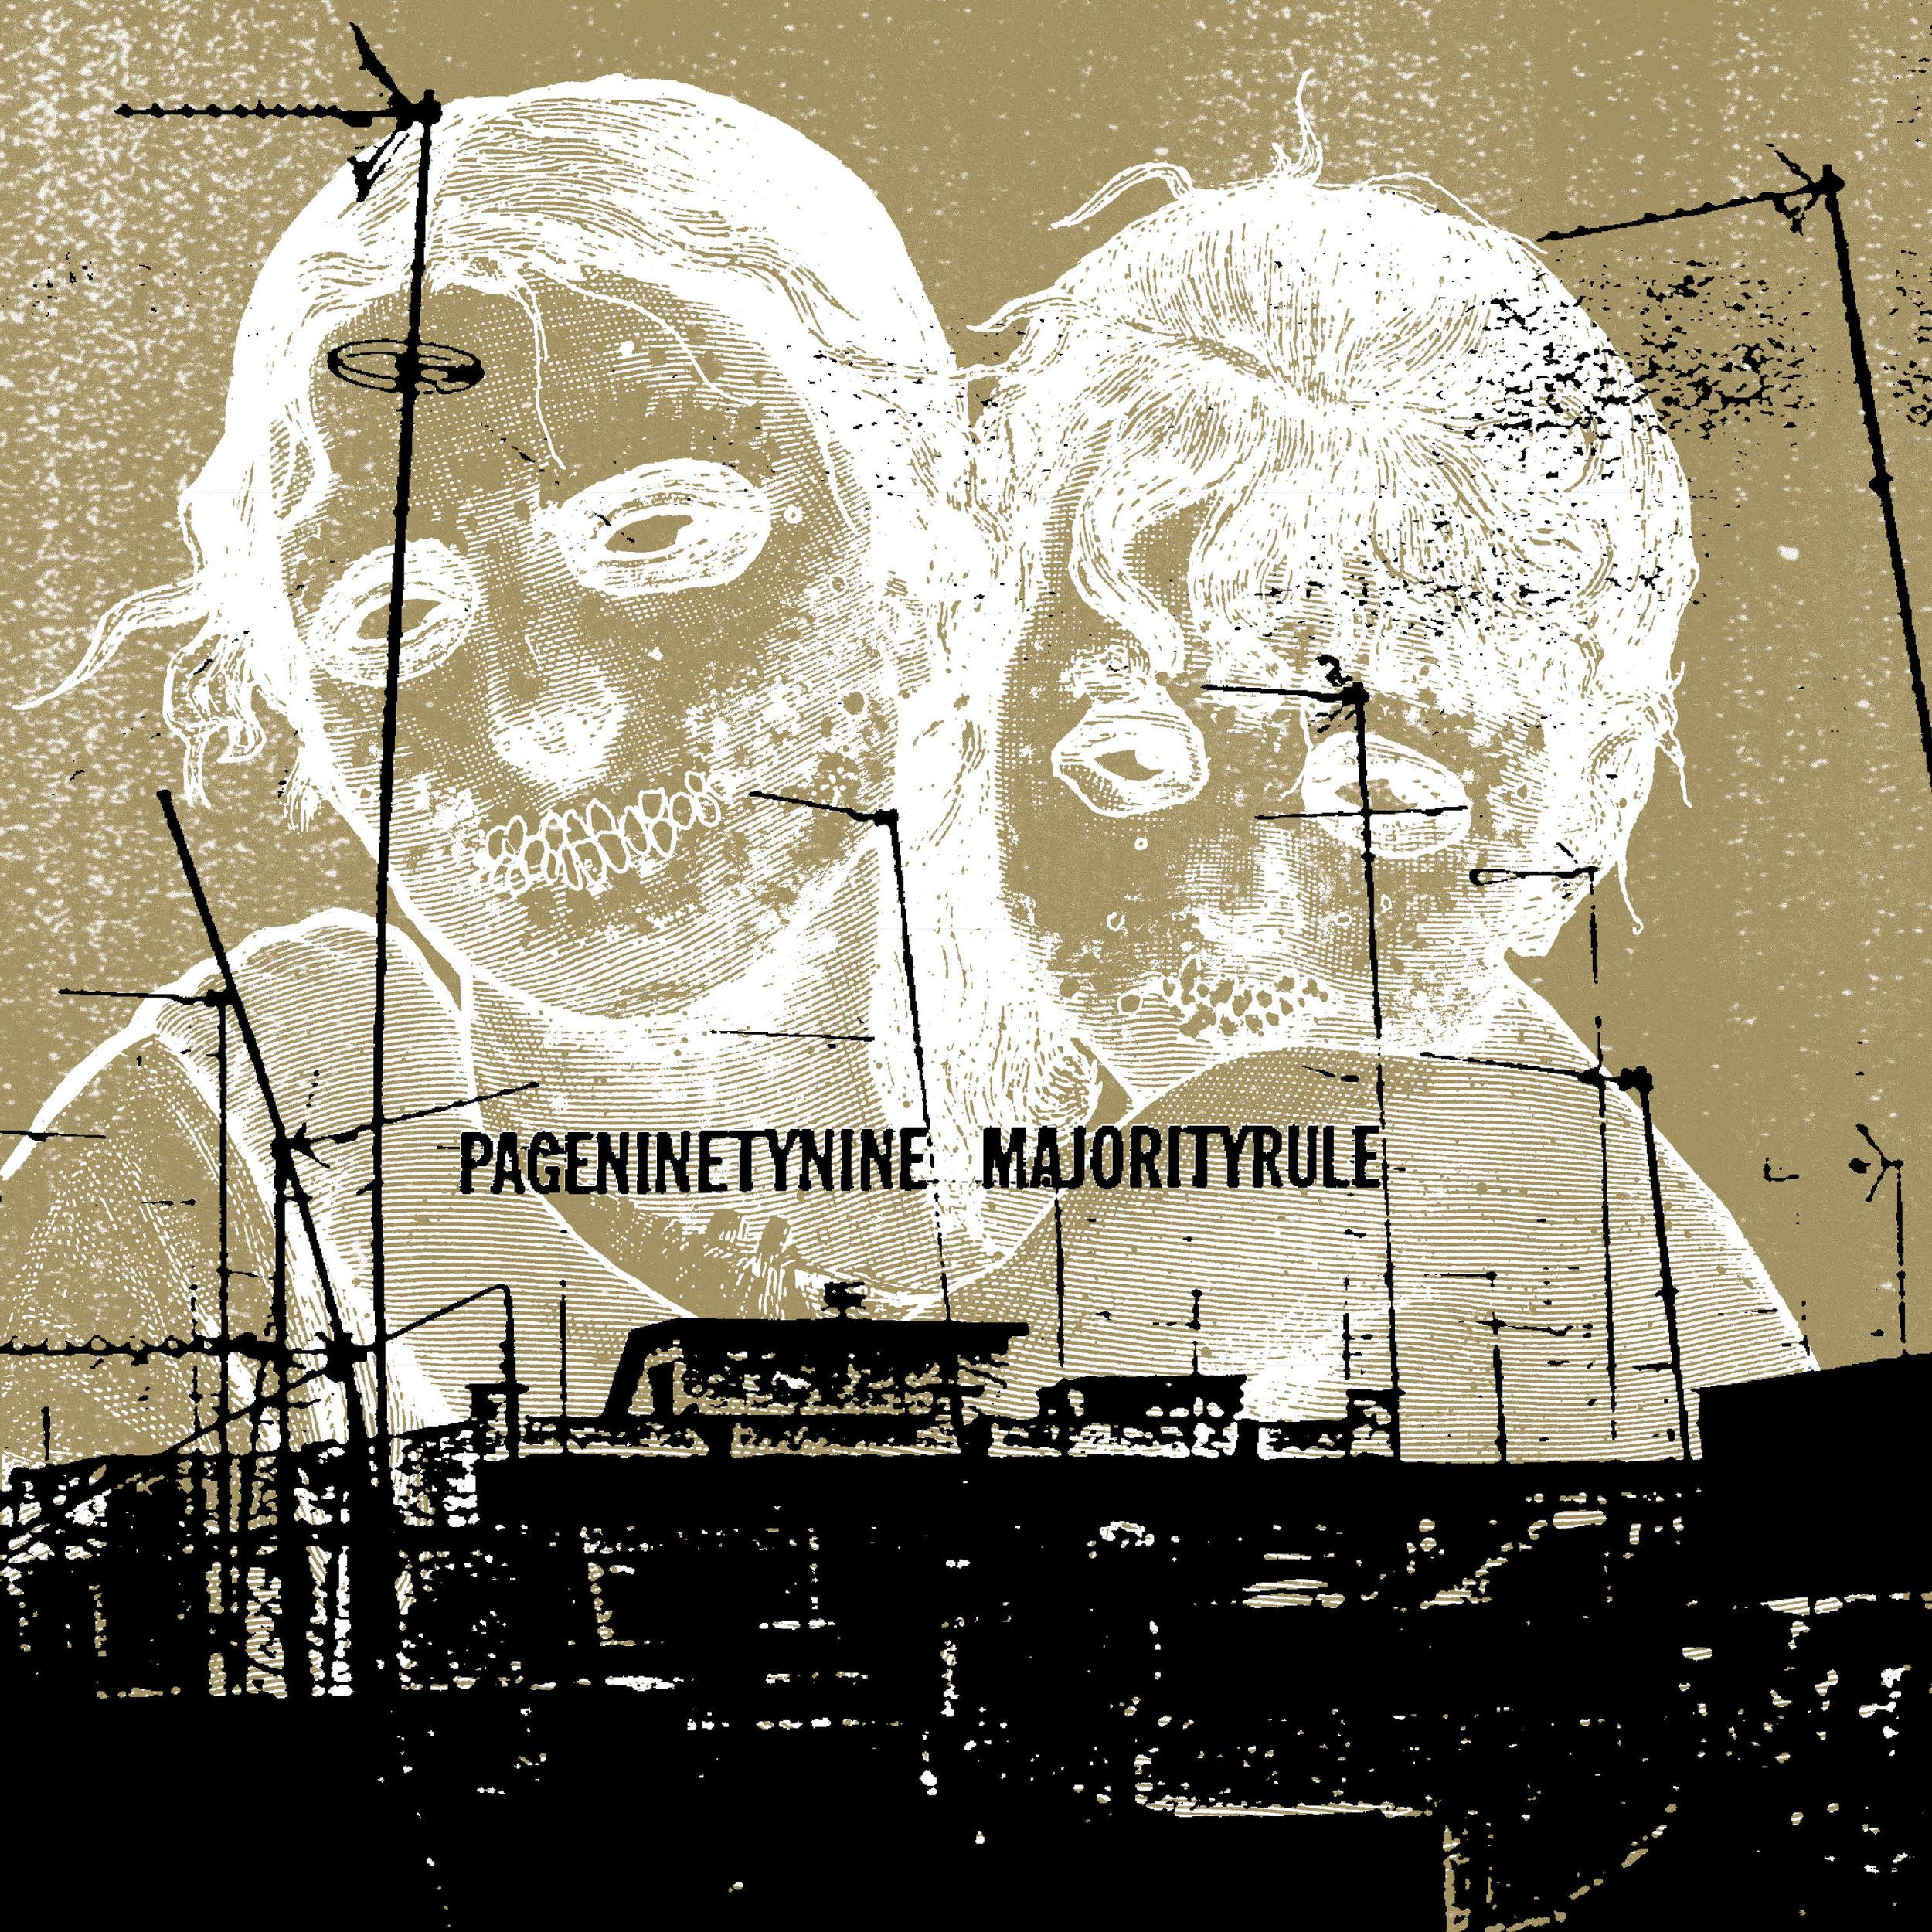 OPS008 - Pageninetynine & Majority RuleSplit LP | Digital